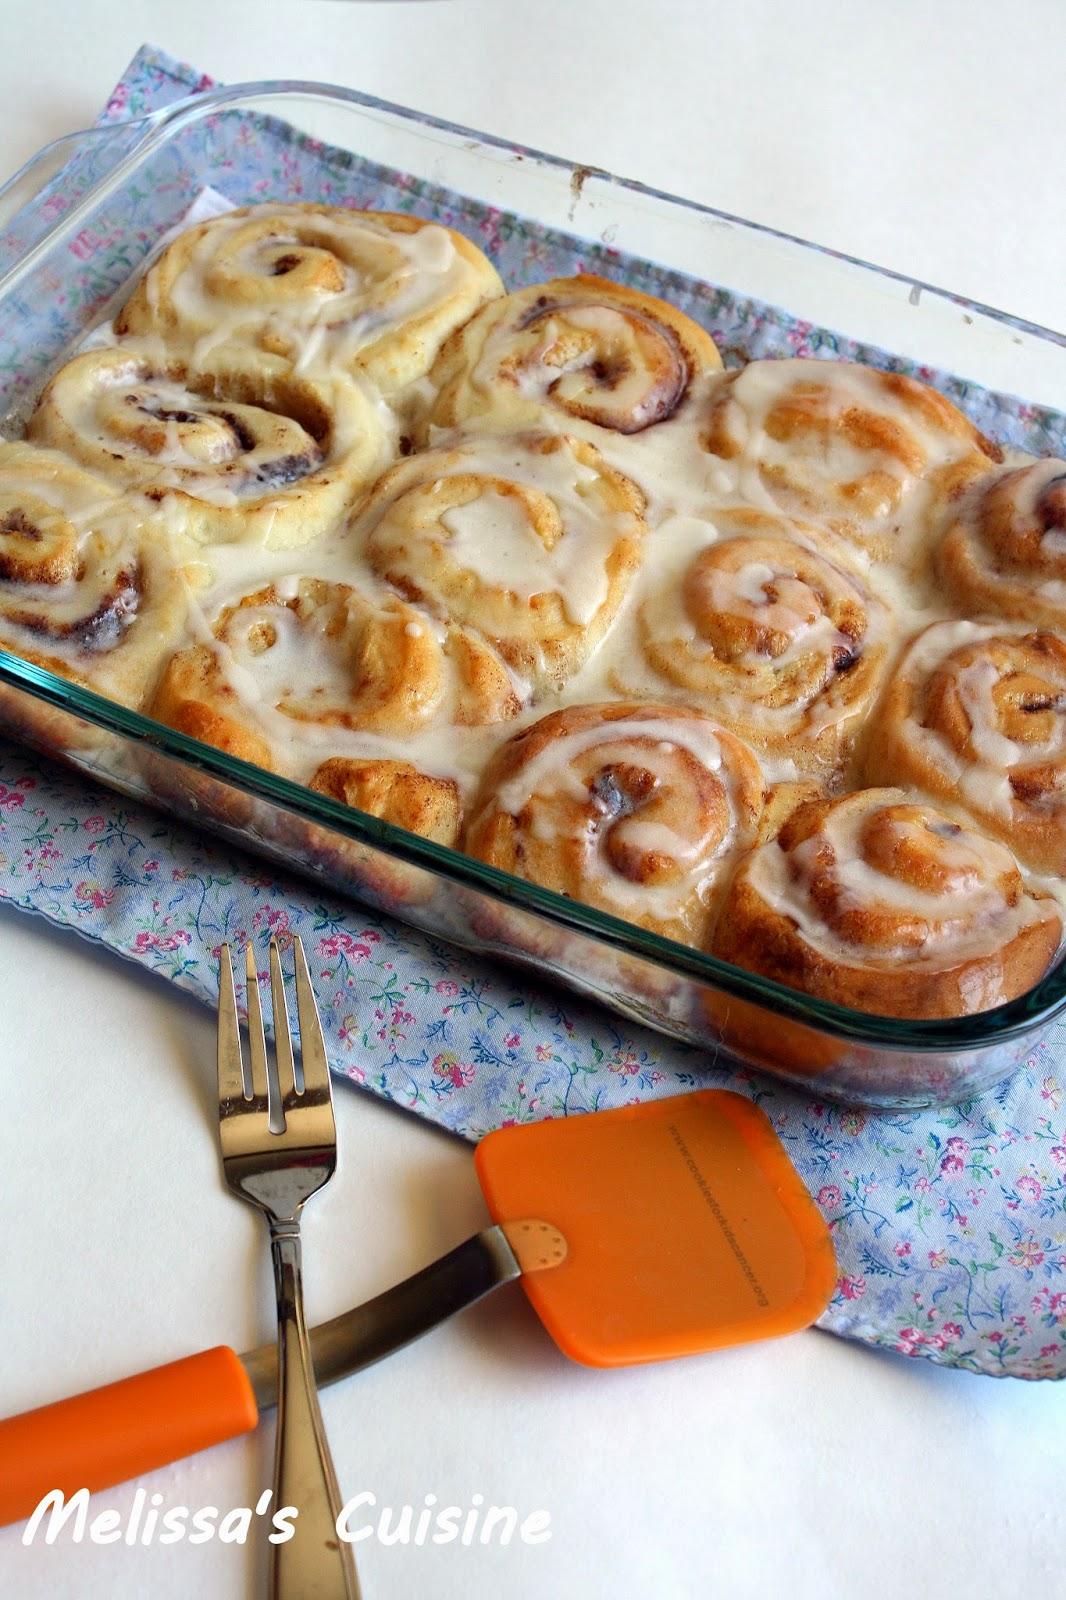 Melissa's Cuisine: Pioneer Woman's Cinnamon Rolls